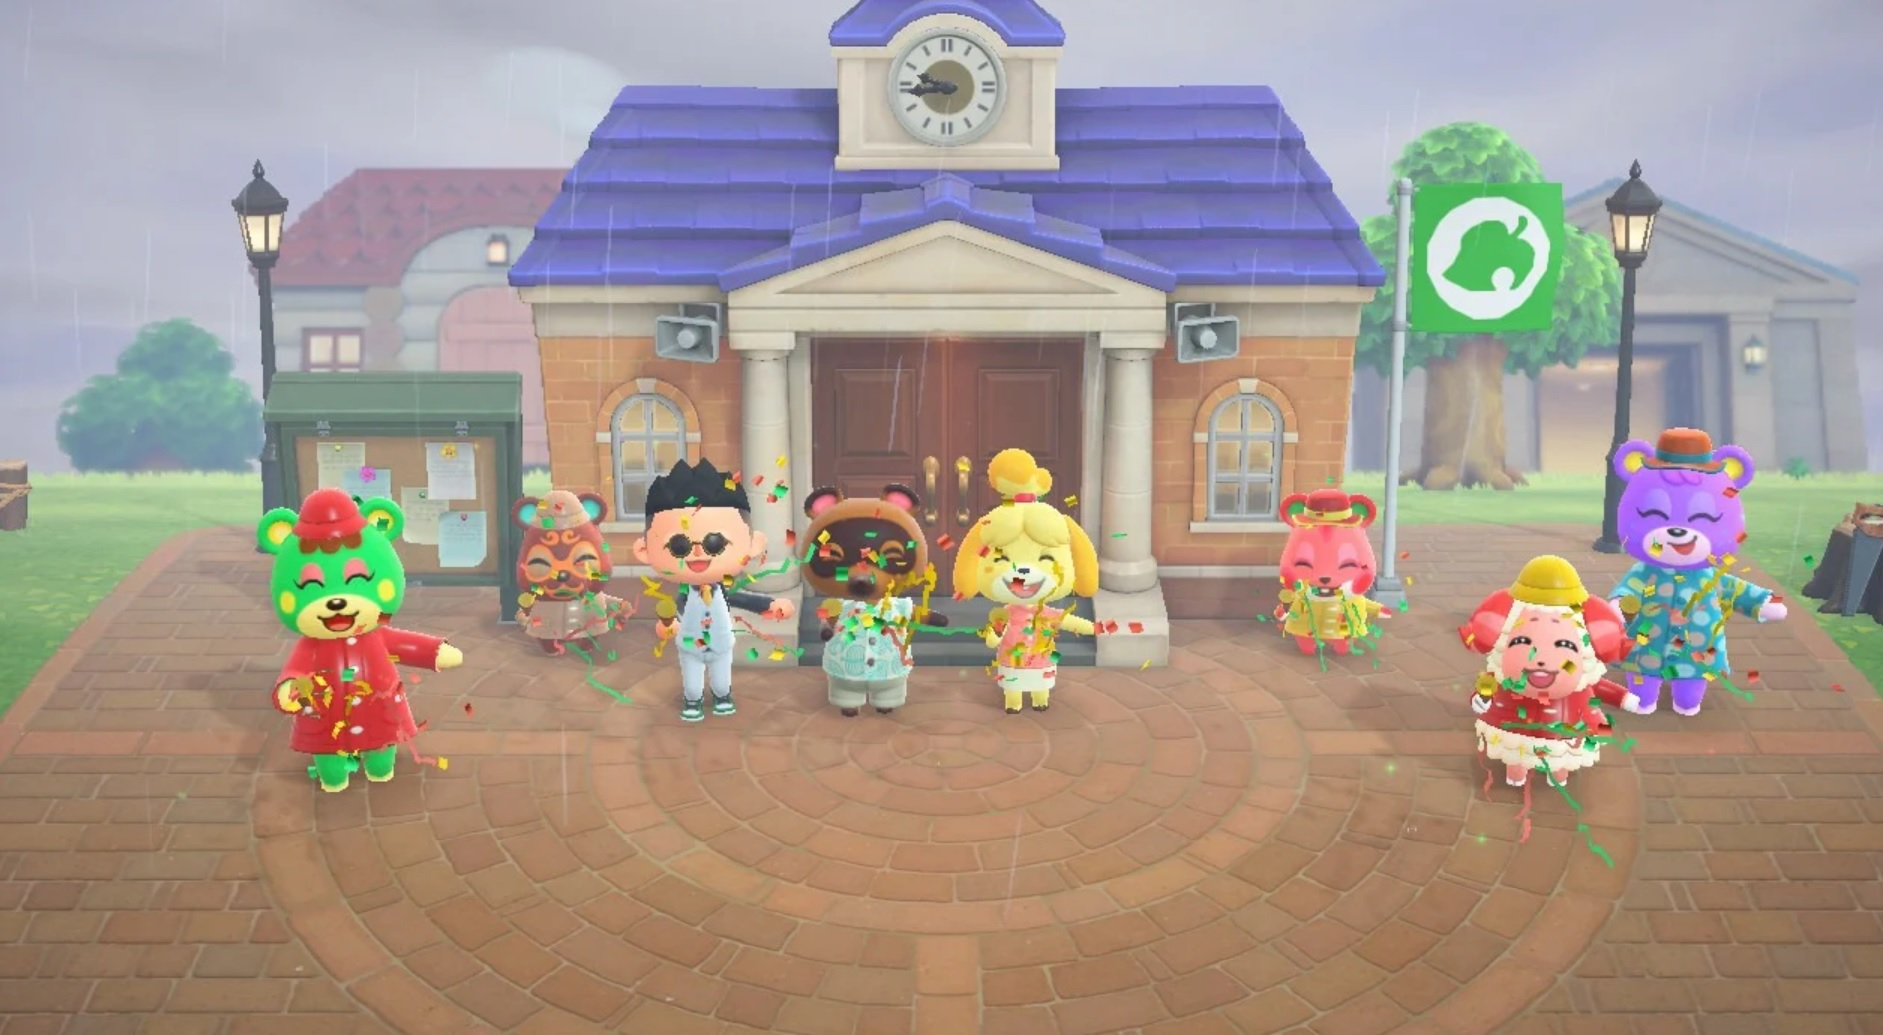 Animal Crossing: New Horizons sales soar over Smash Ultimate as Nintendo updates their top 10 seller list screenshot